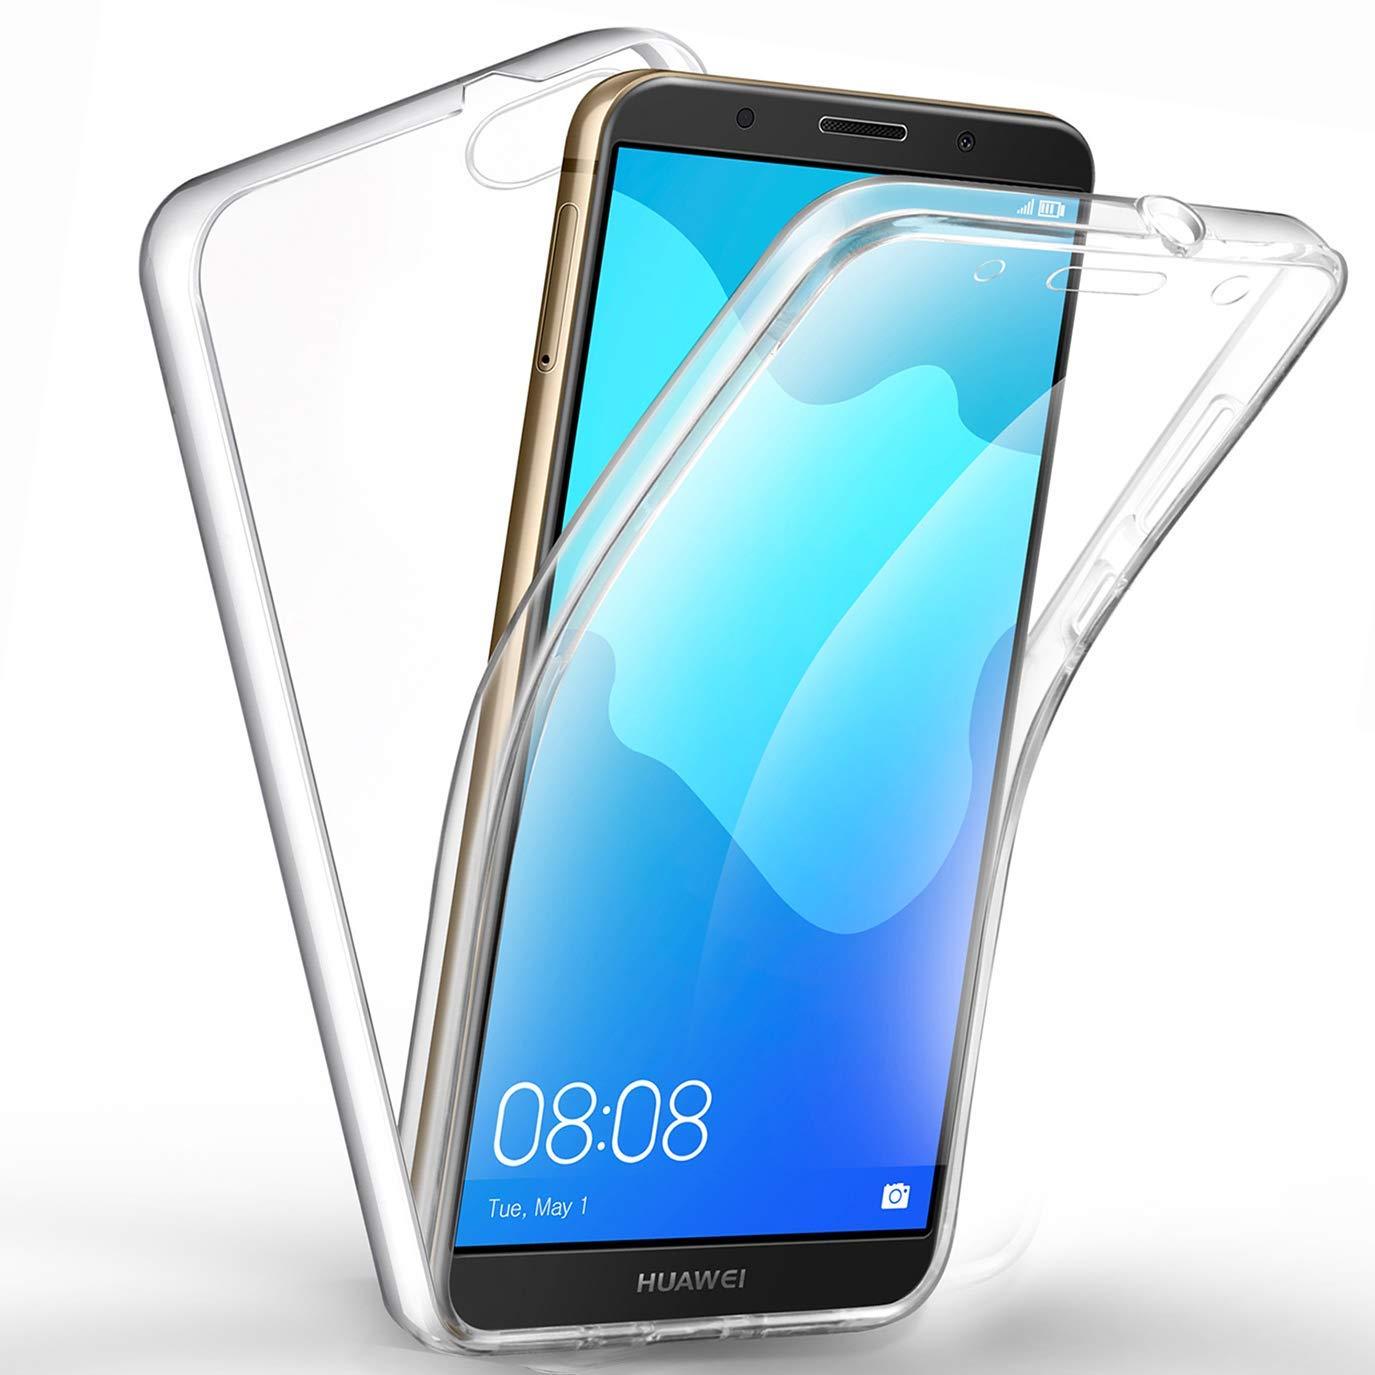 360 Degree Case for HUAWEI Nova 3 3i 2i P30 P20 P8 Lite 2017 Y7 Y9 Y6 Y5 Prime 2018 Honor 7S 7A 7C P Smart 2019 Plus Soft Cover